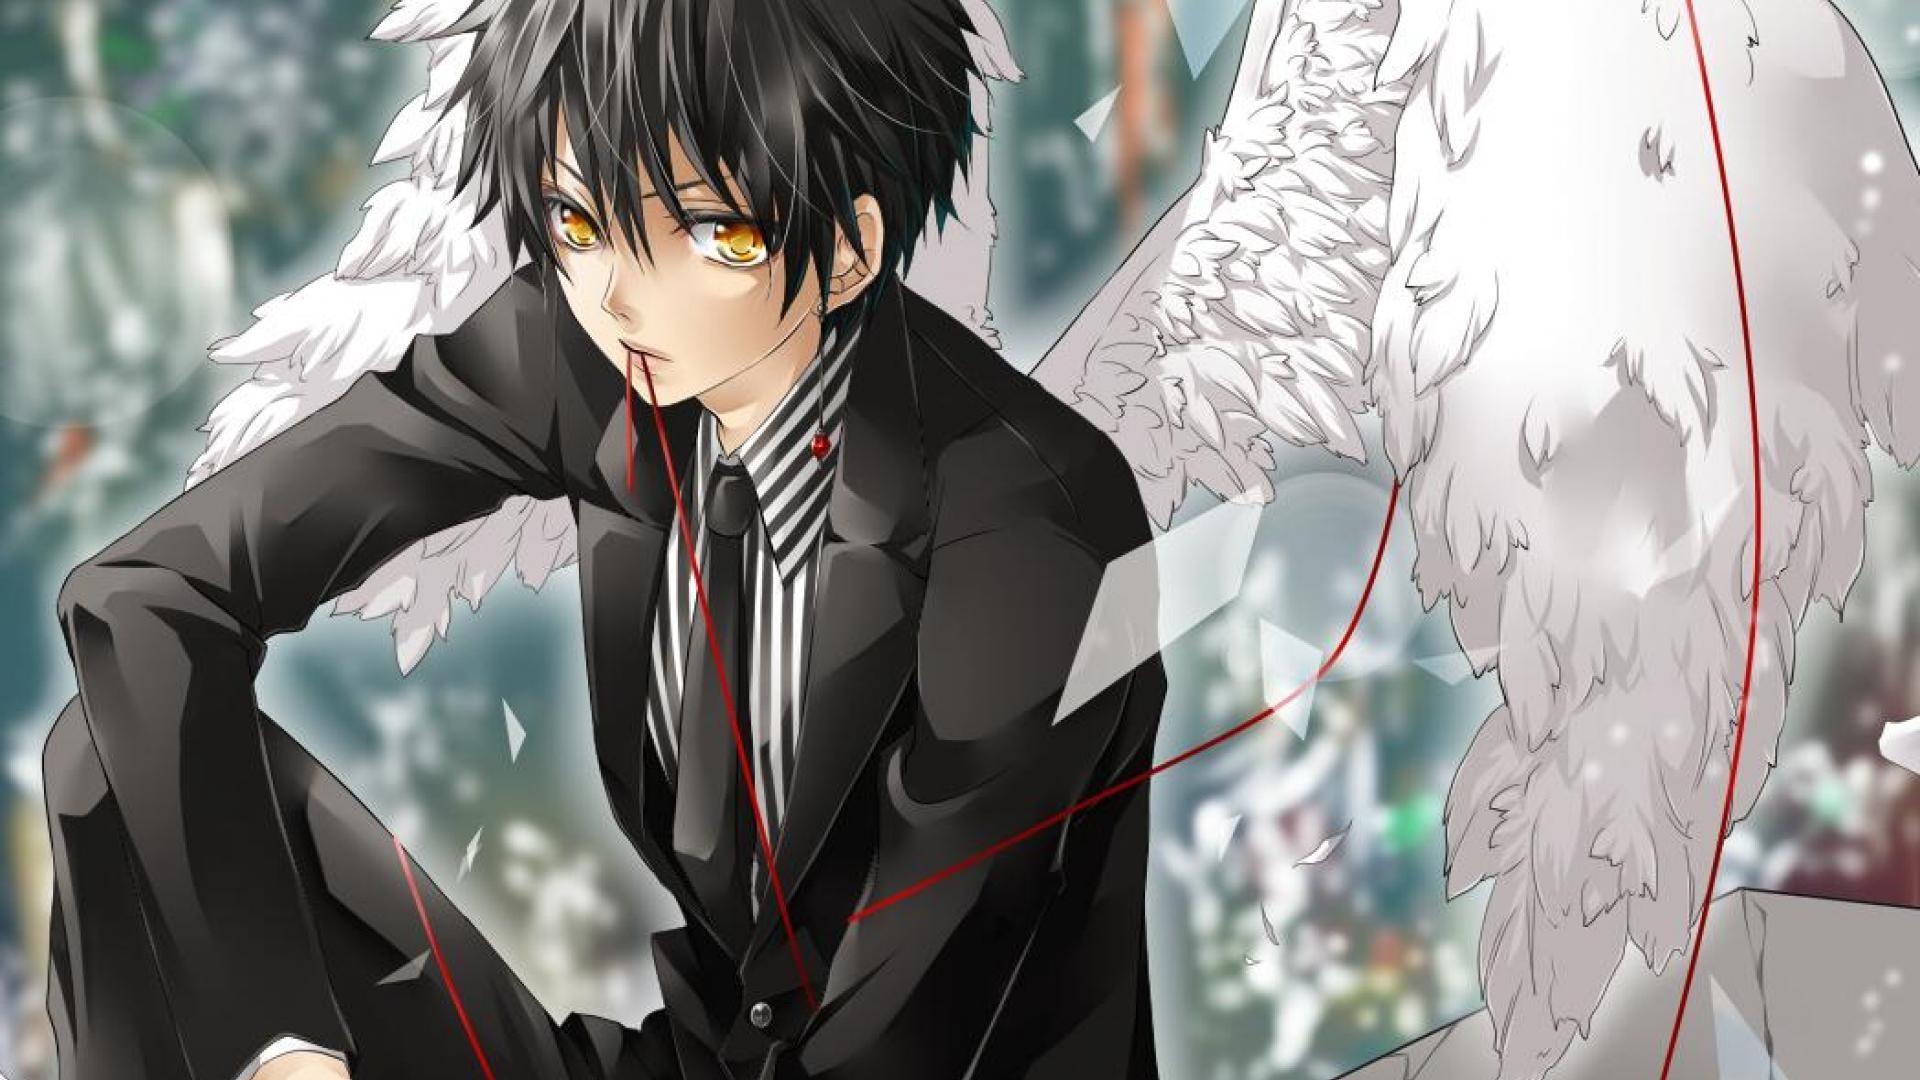 Anime Angel Boy Wallpaper